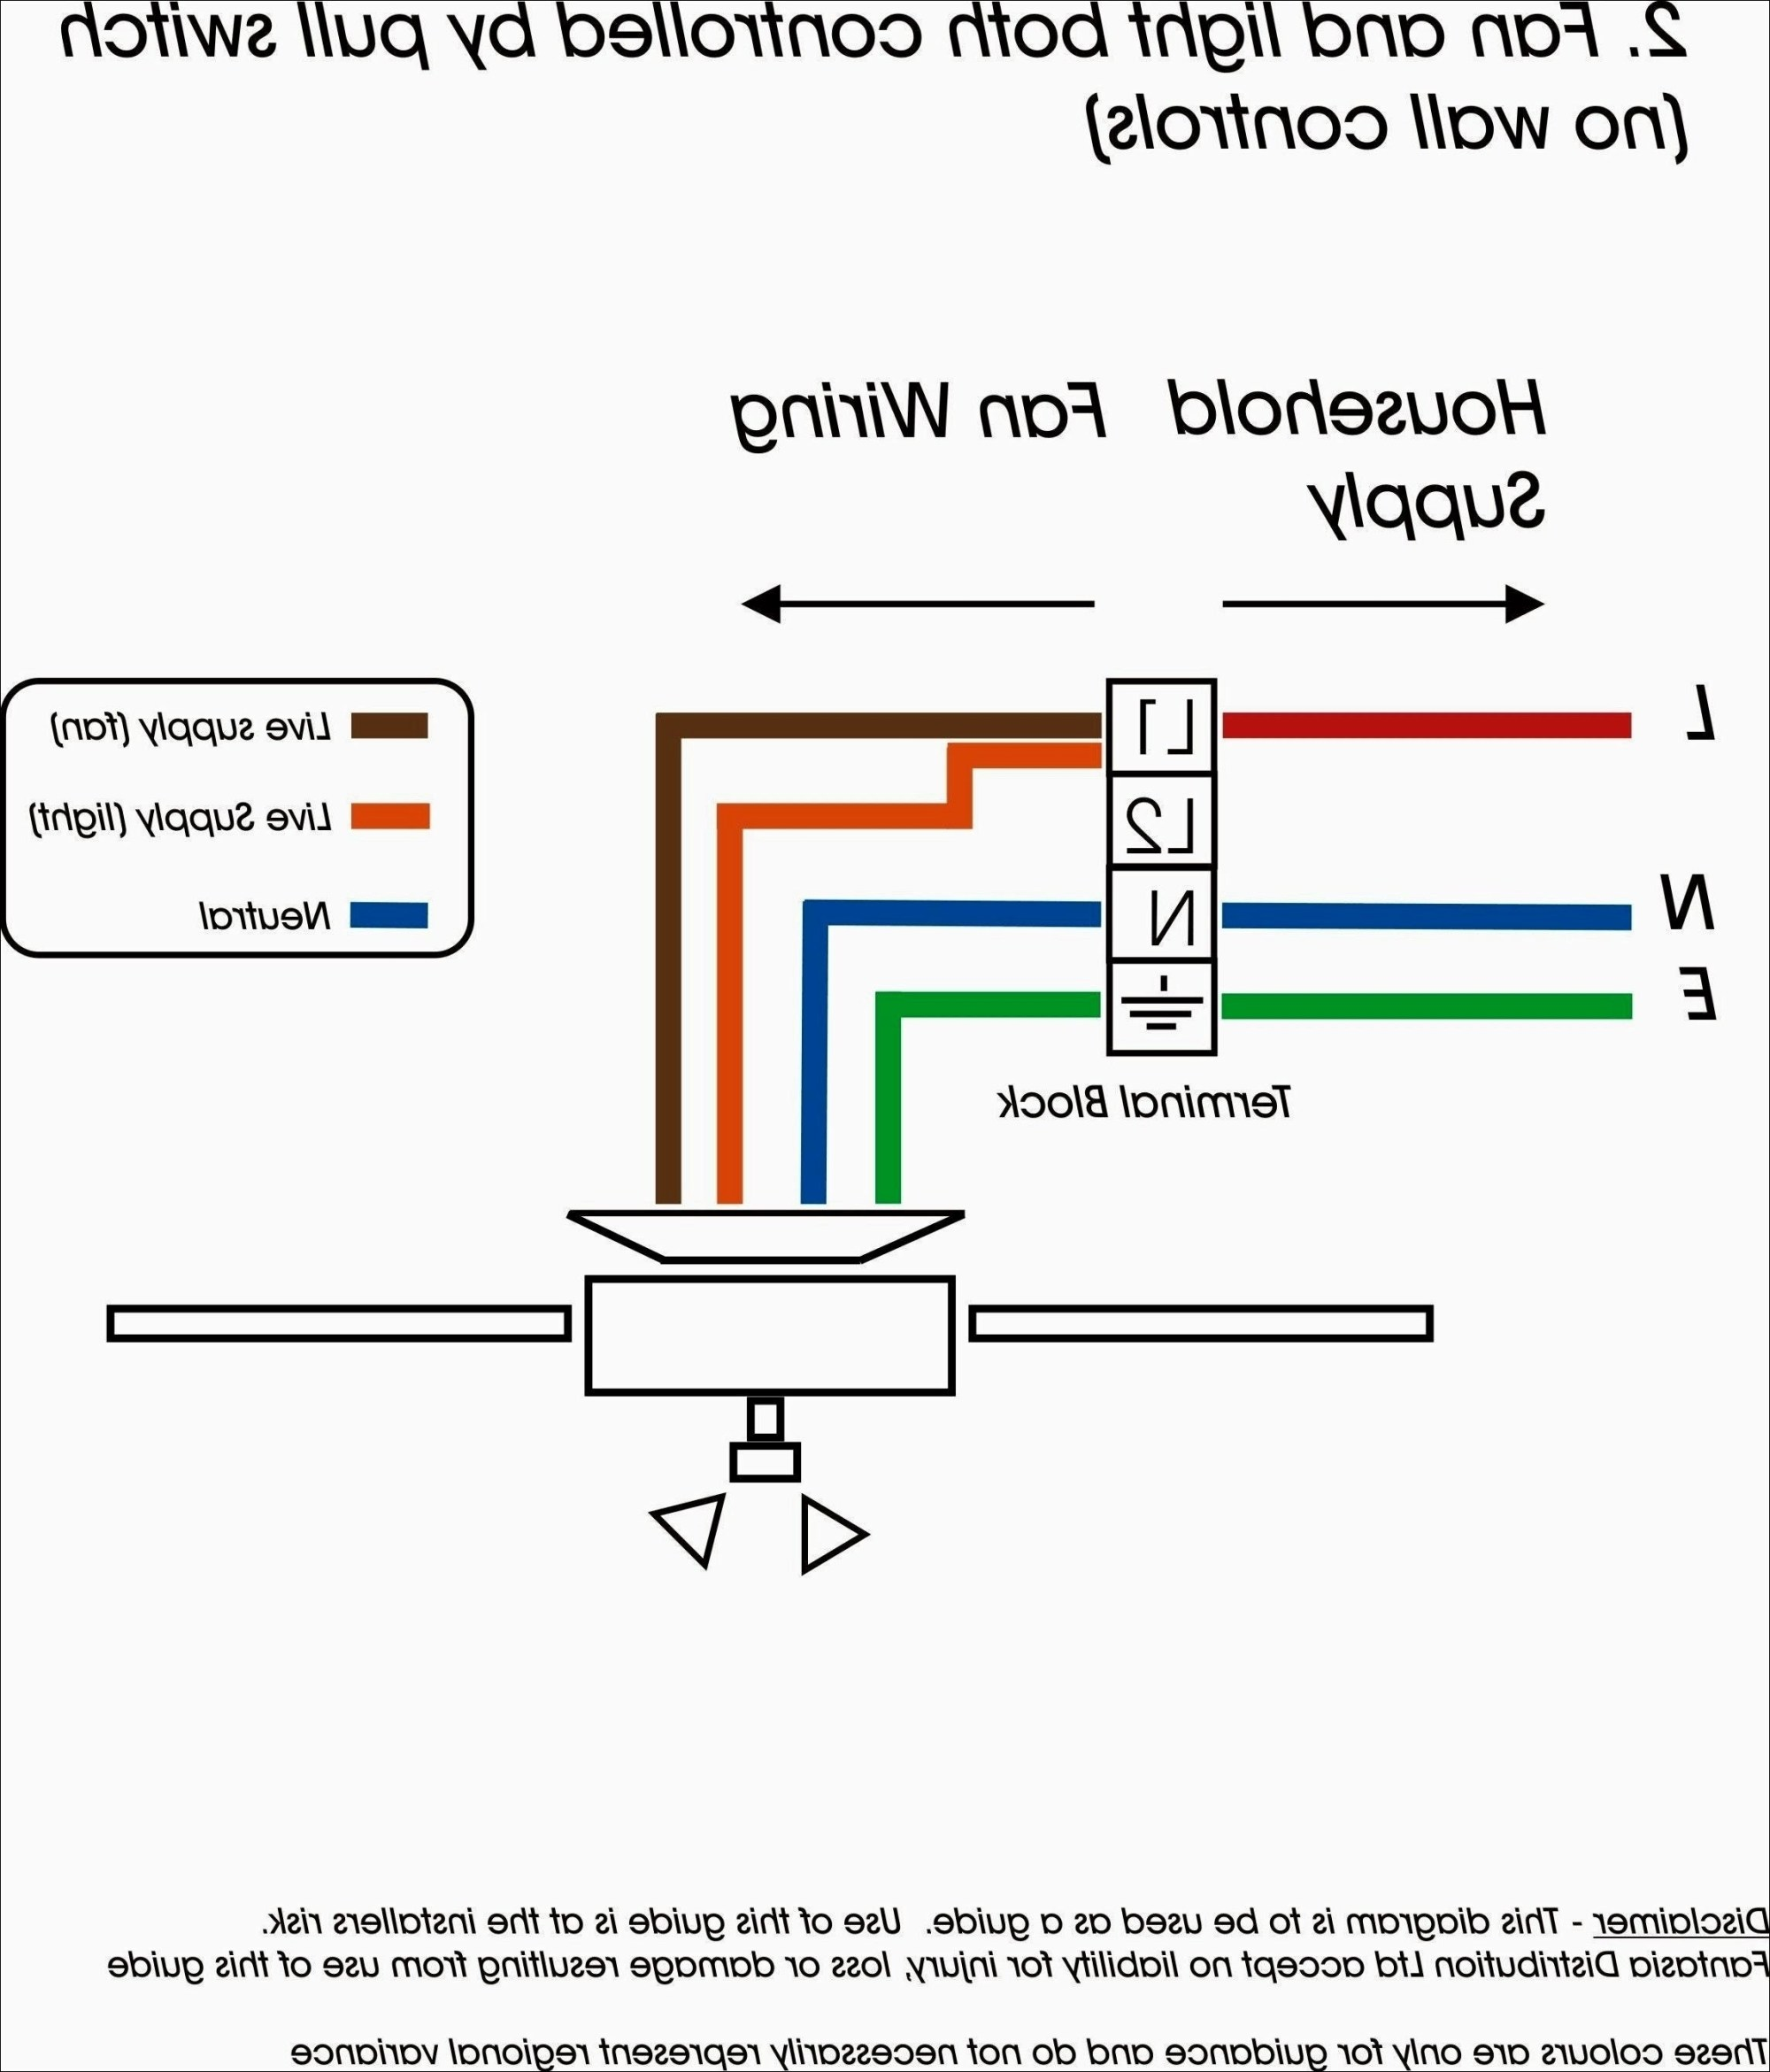 hight resolution of honeywell fan limit switch wiring diagram free wiring diagram honeywell pressure switch wiring diagram honeywell fan